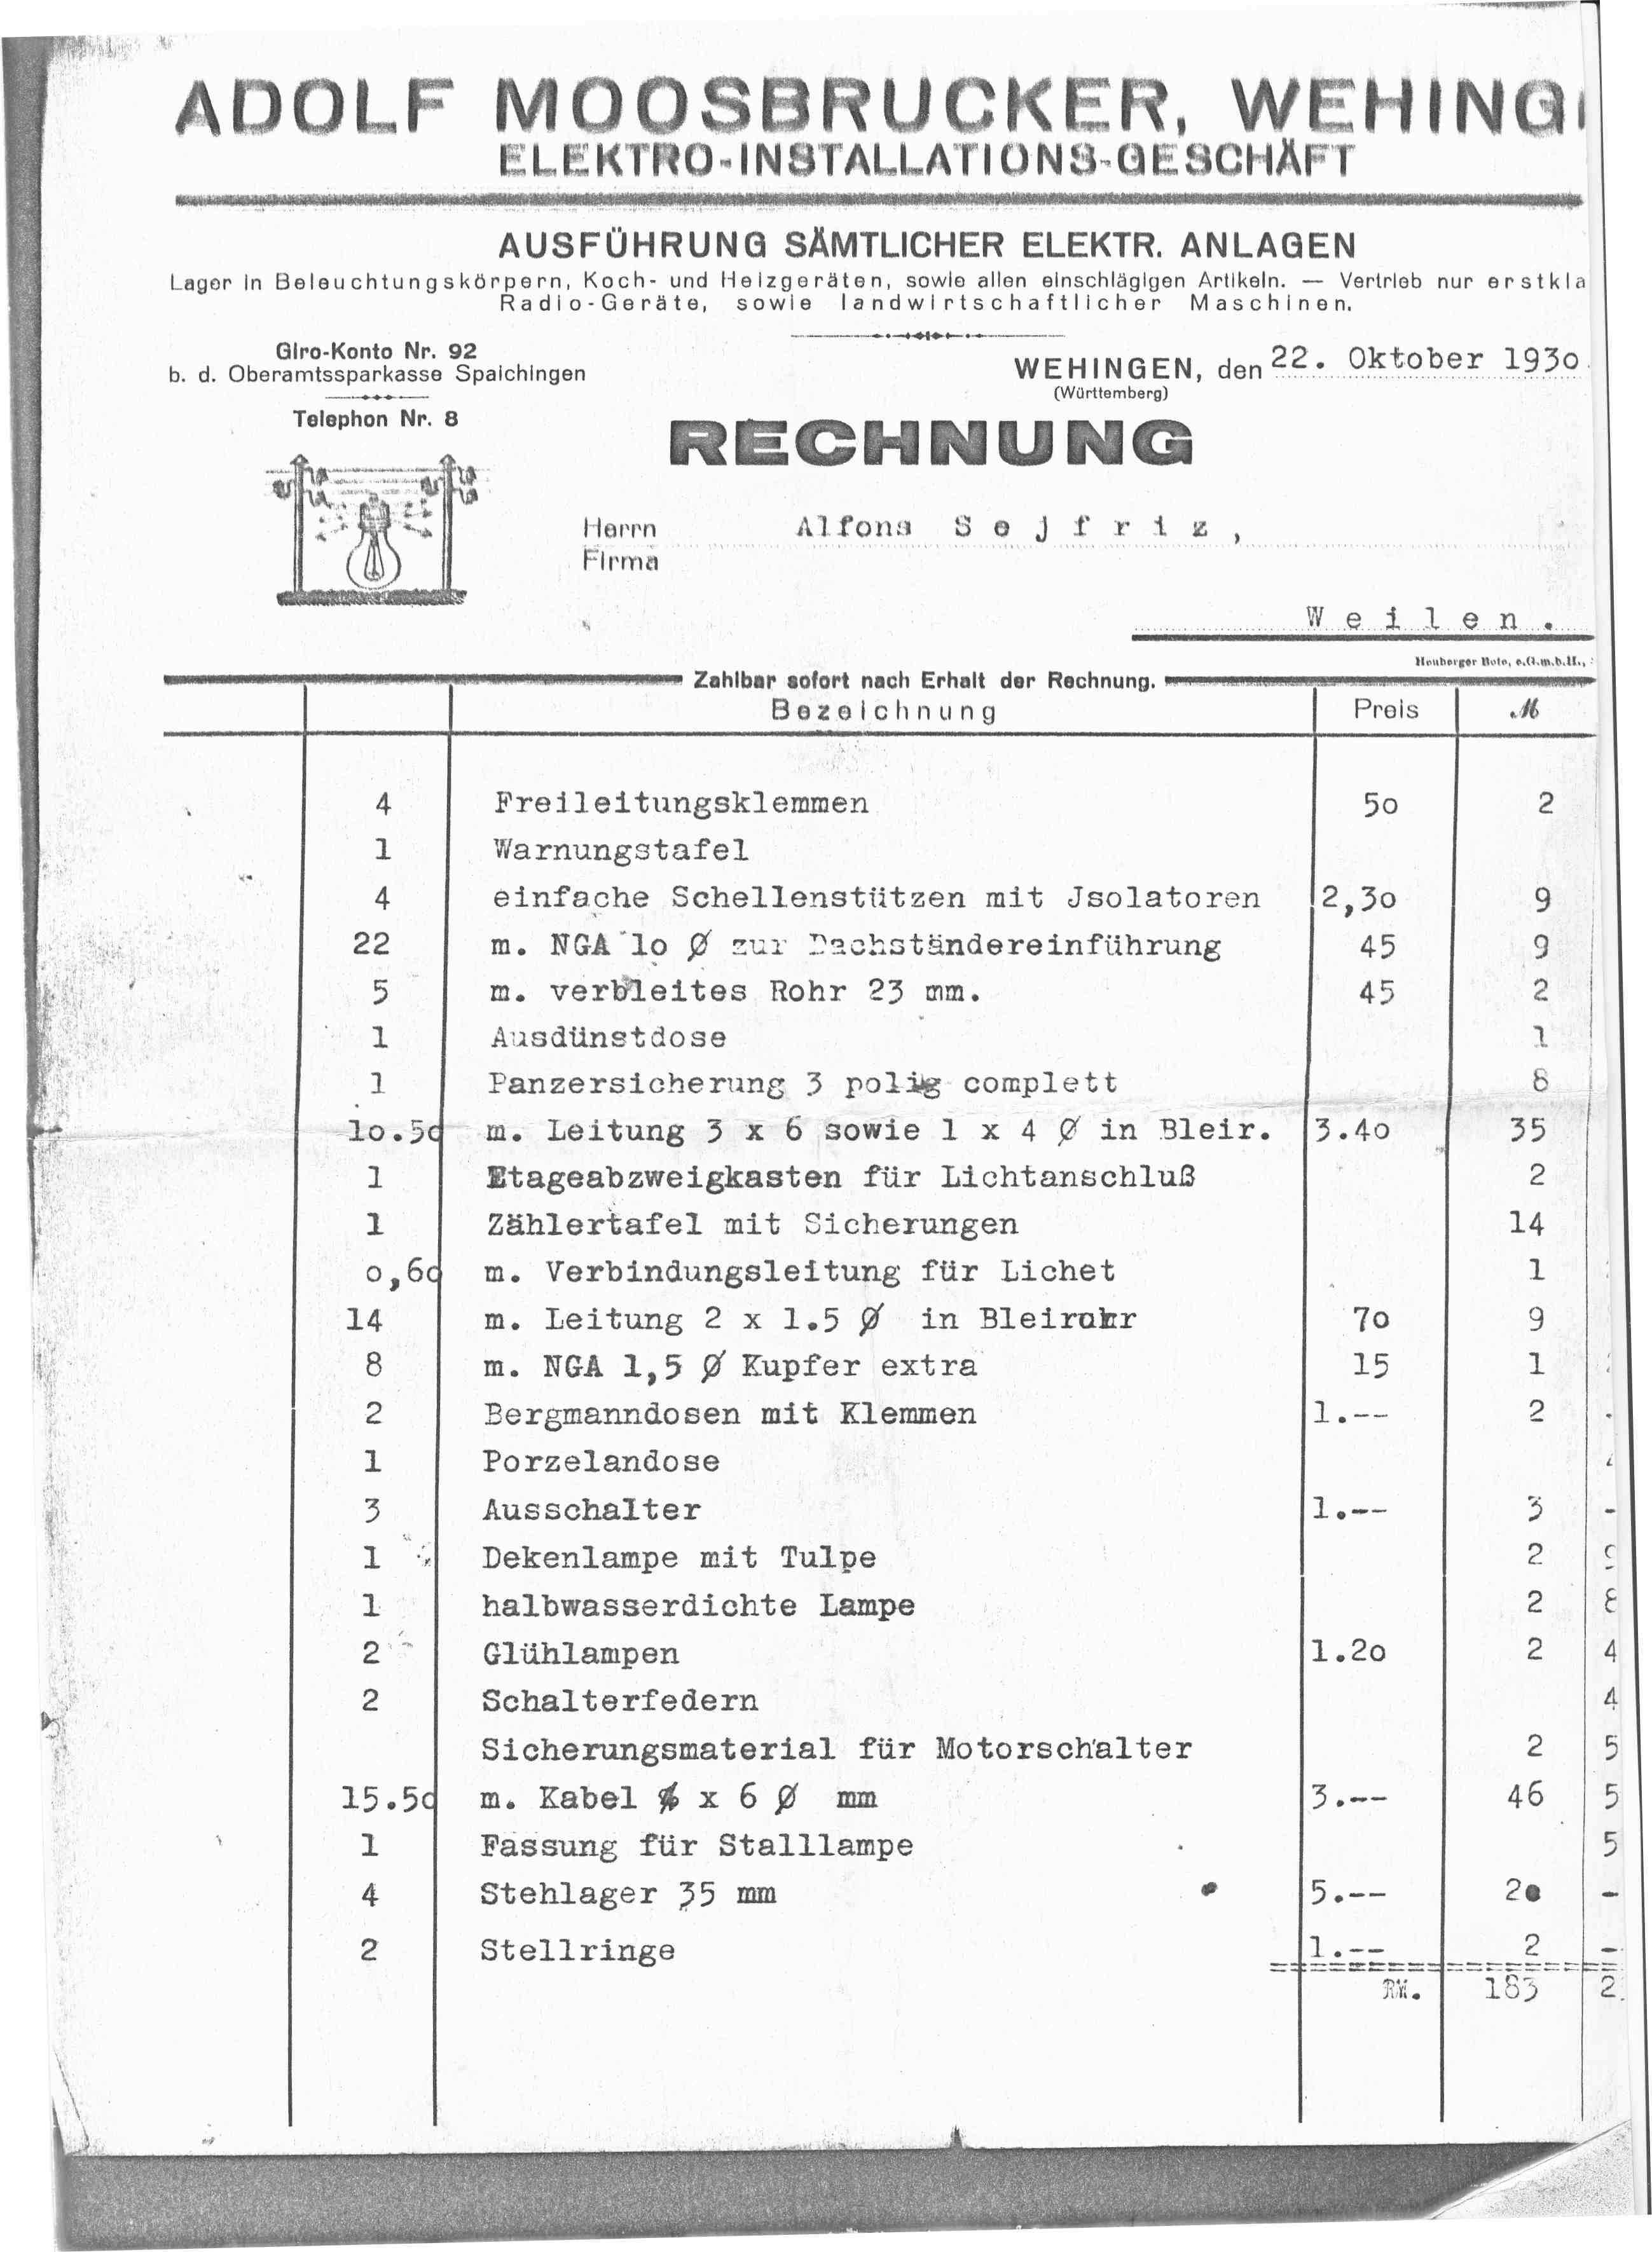 1930 Rechnung - Elektrotechnik Moosbrucker